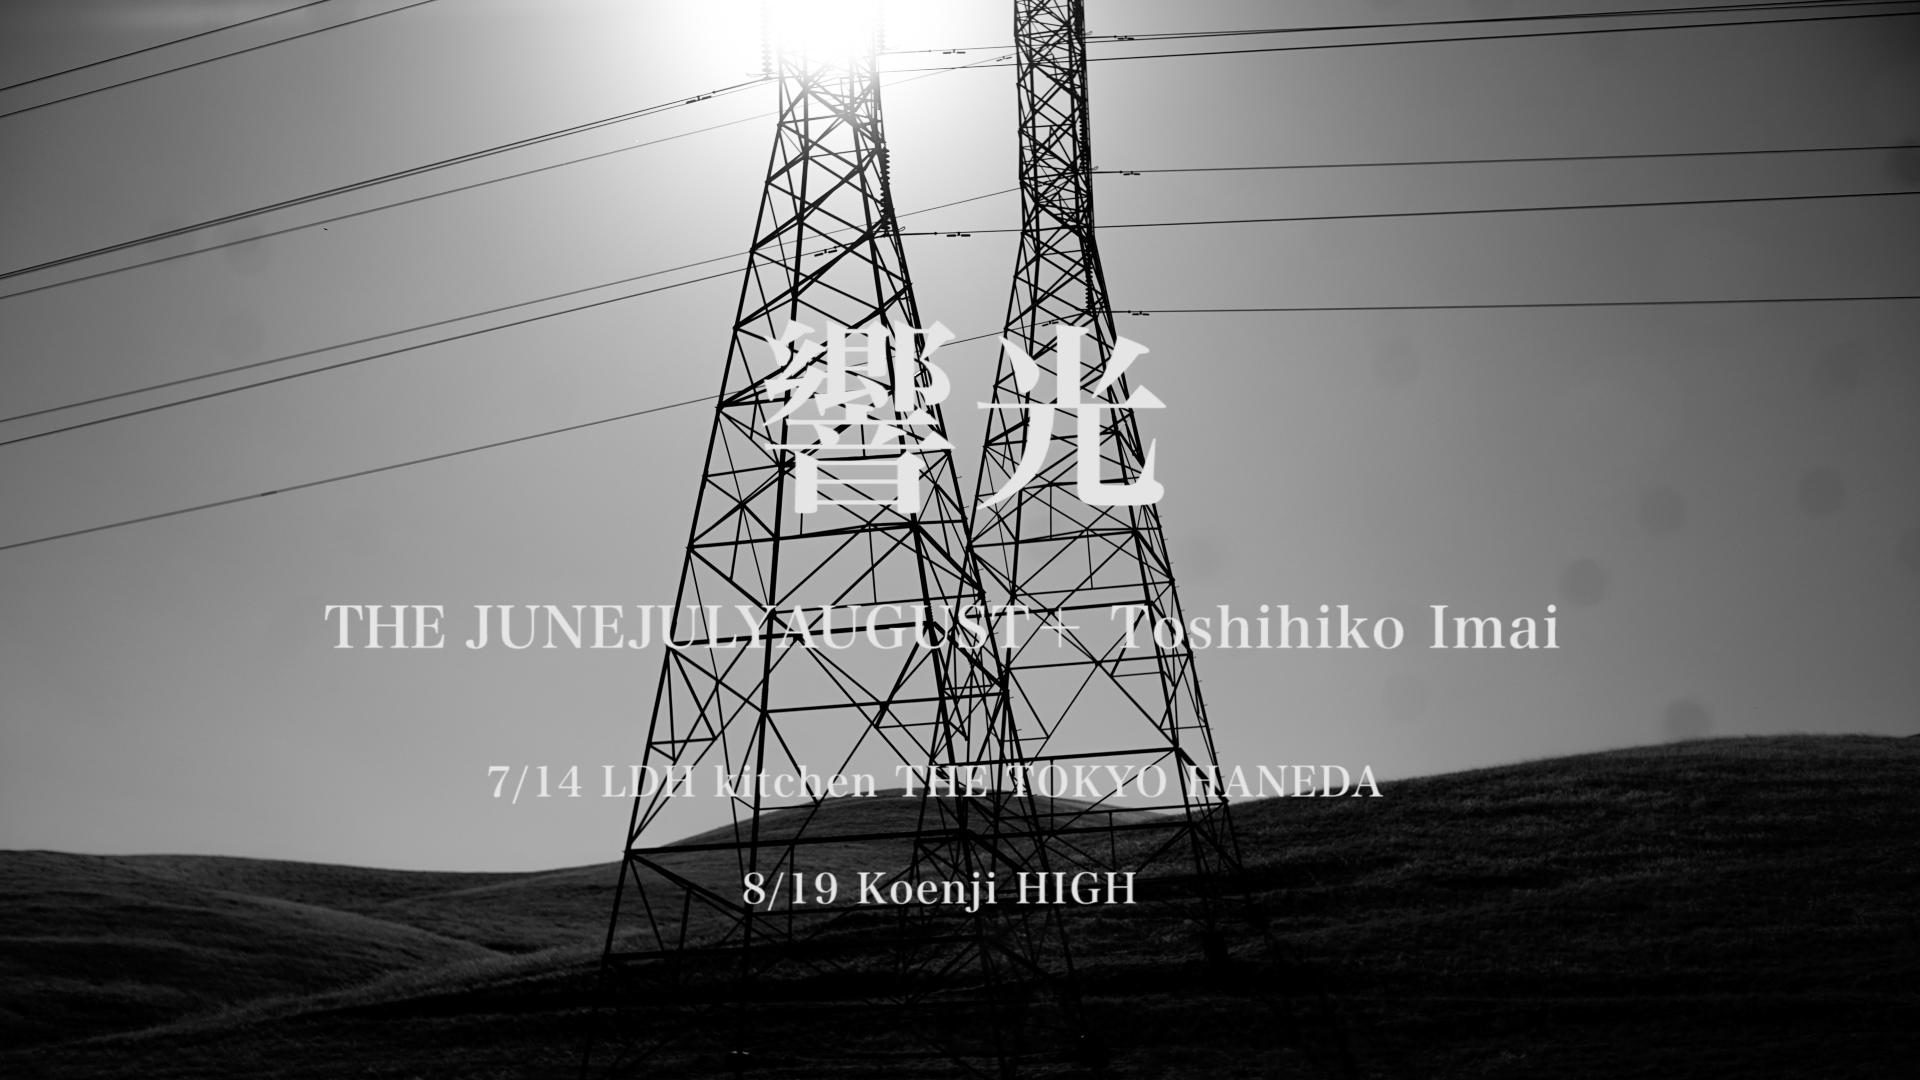 8/19(木) THE JUNEJULYAUGUST × Toshihiko Imai 一次先行受付 & 二次受付